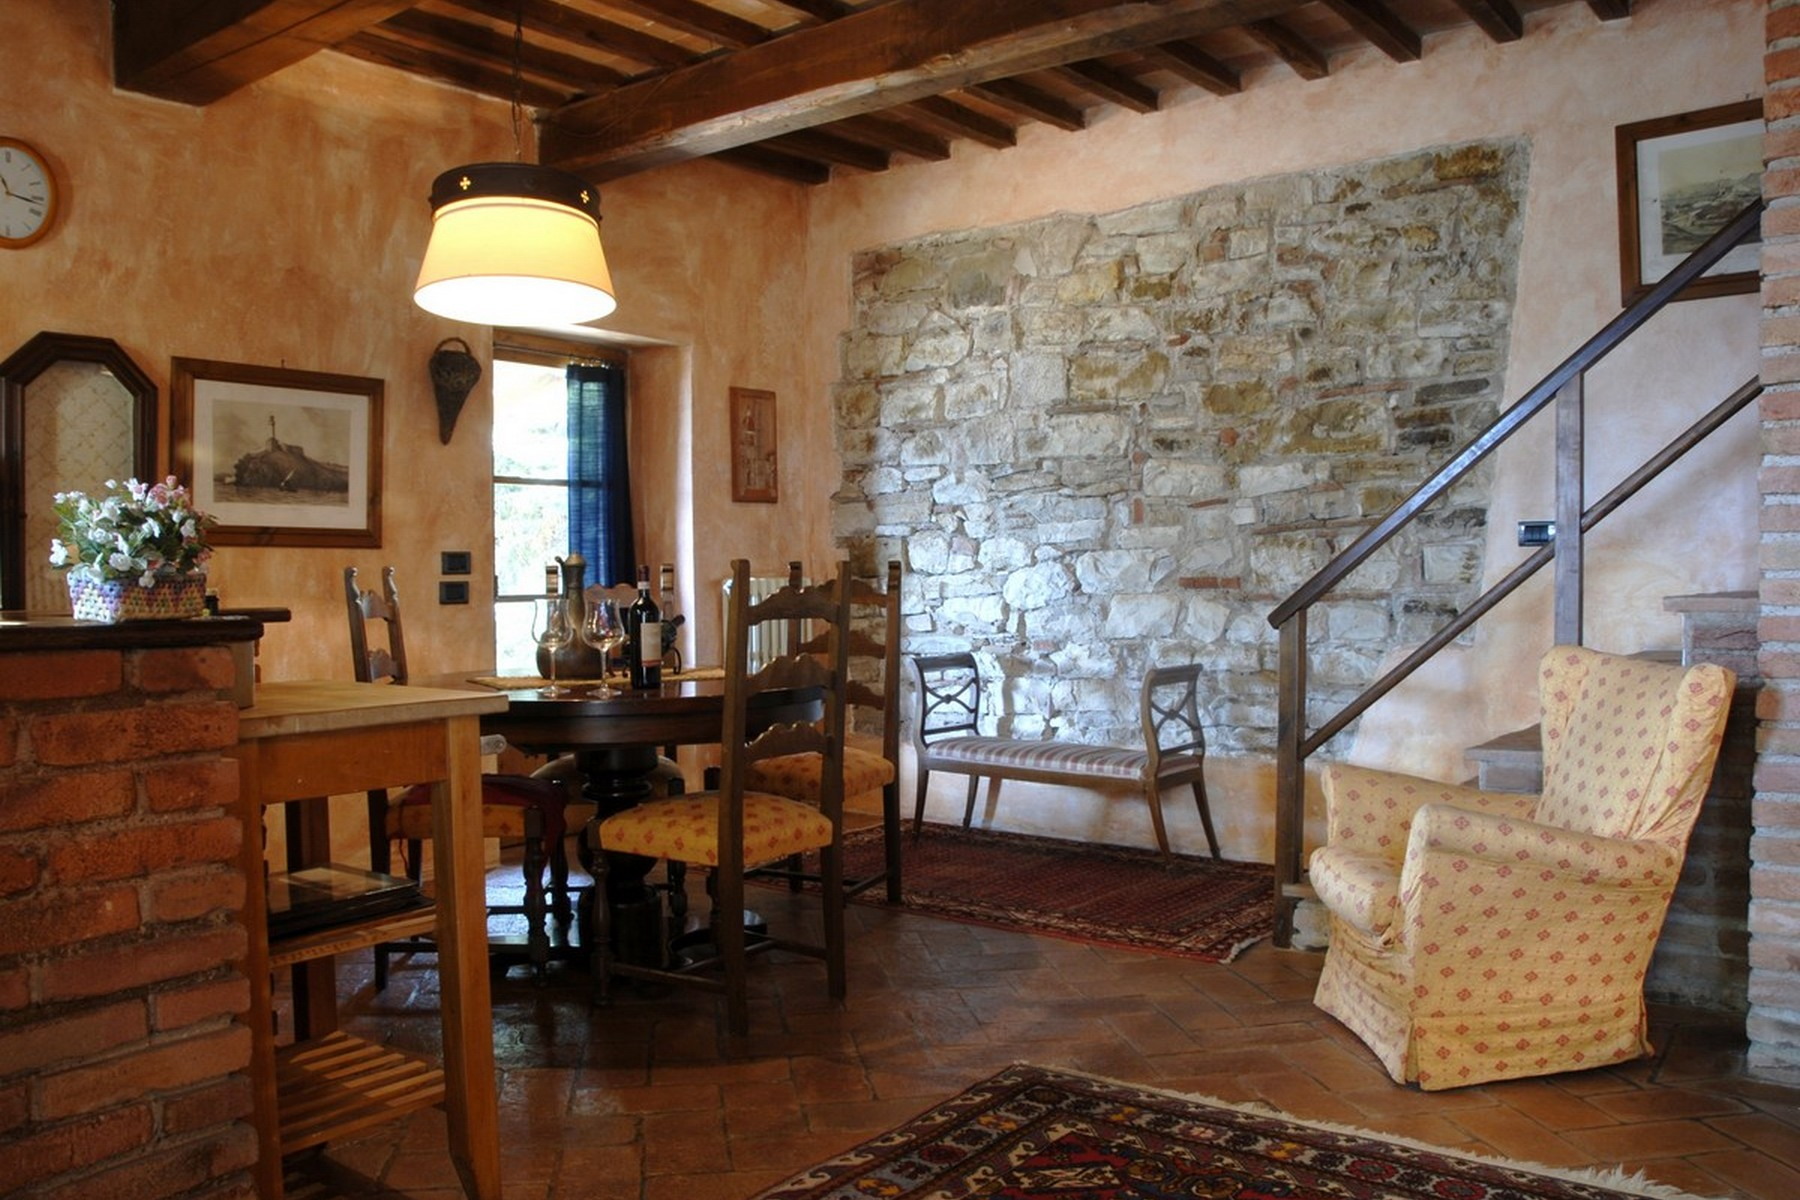 Villa in Vendita a Greve In Chianti: 5 locali, 400 mq - Foto 7